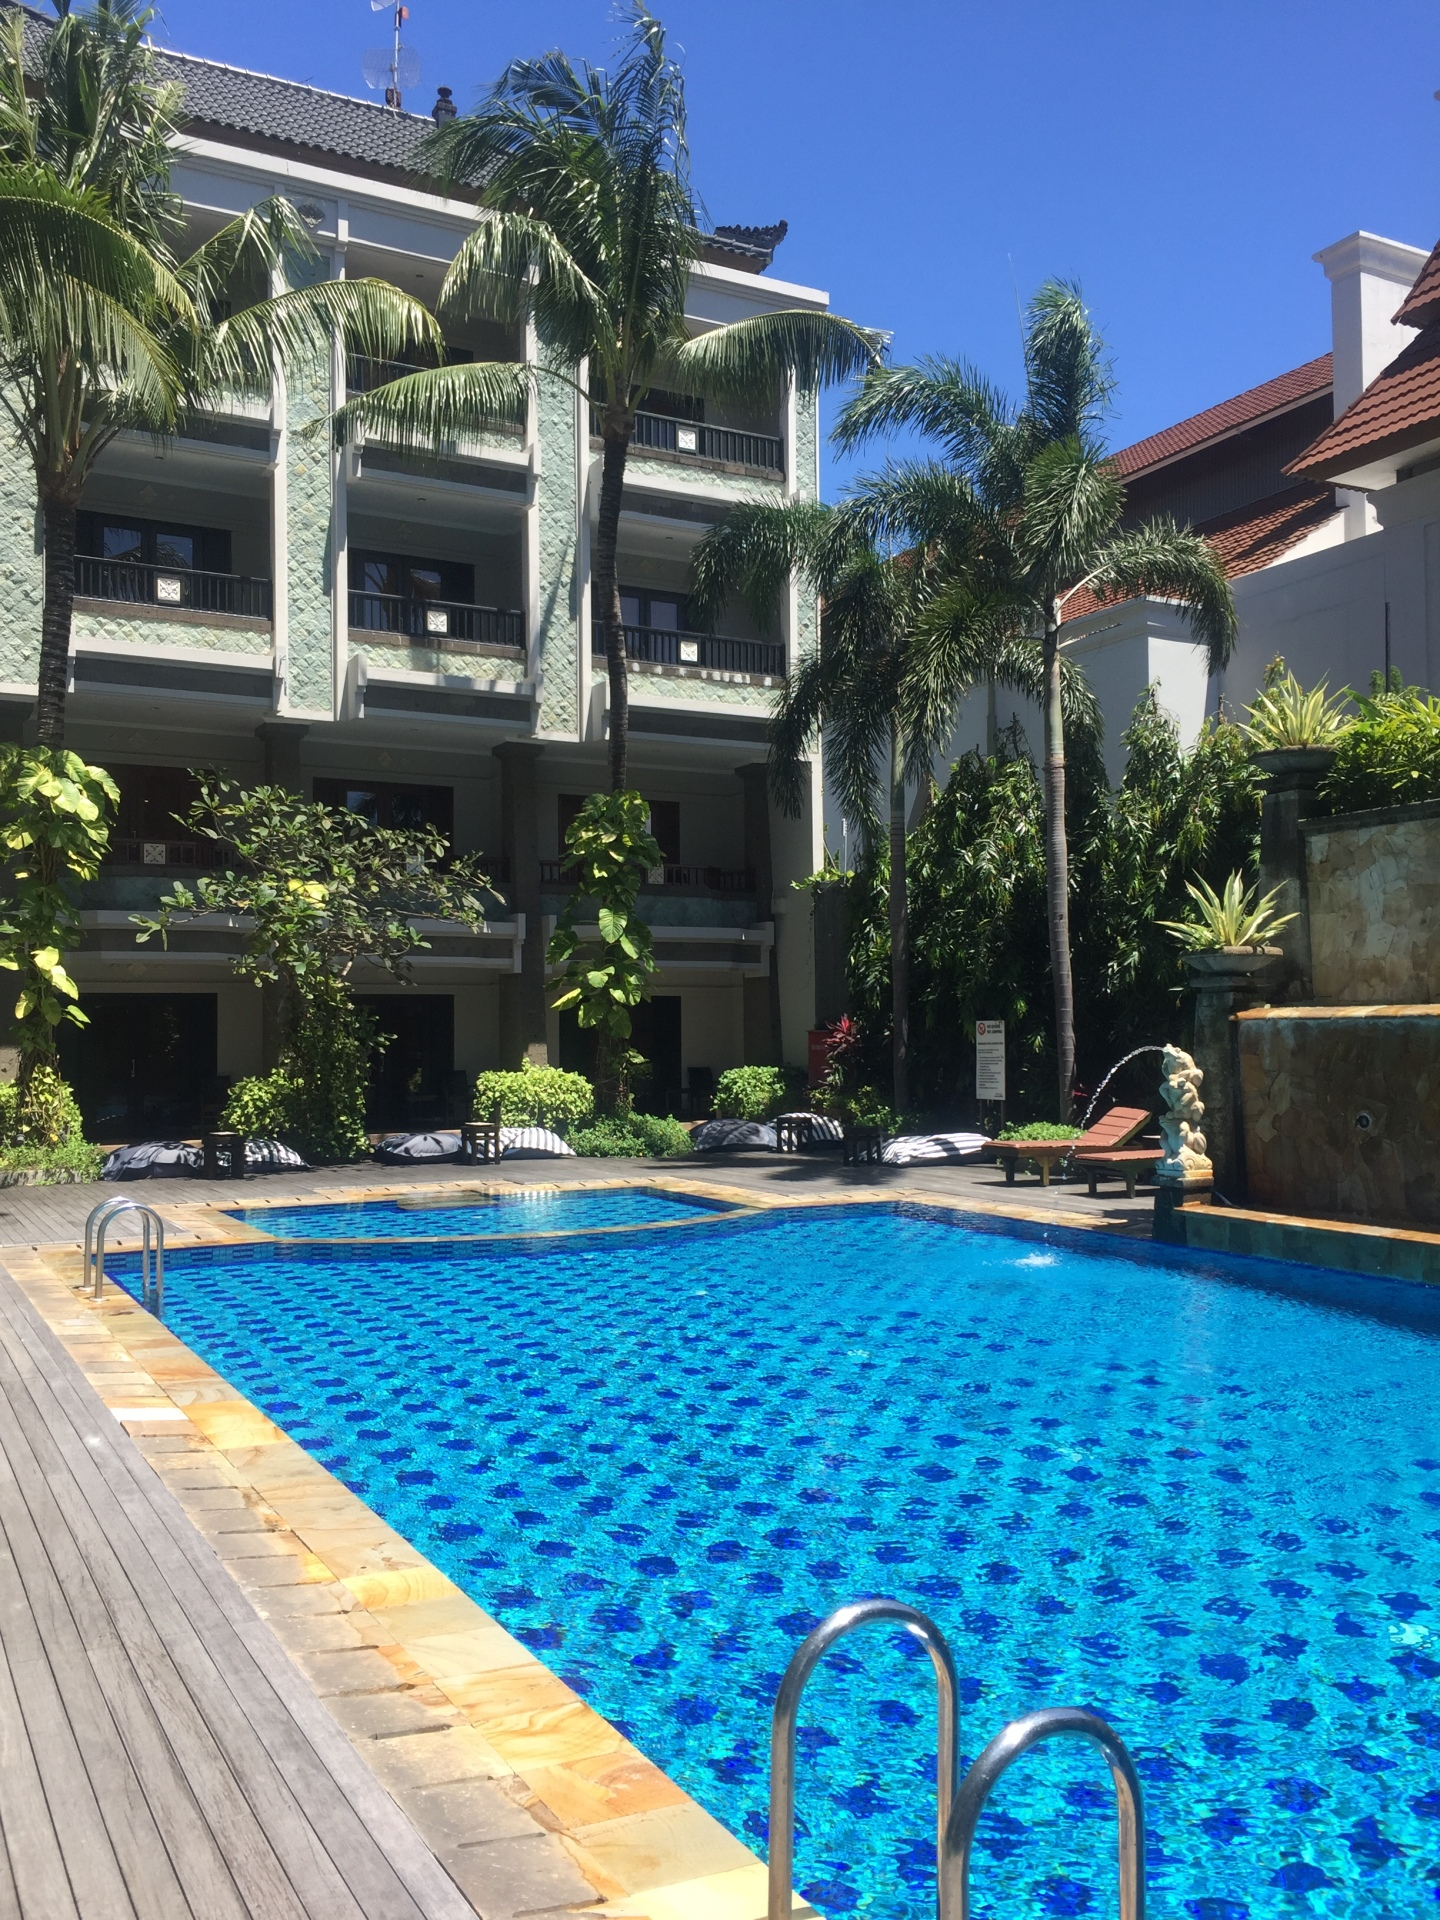 Bali - The Vira Bali Boutique Hotel & Suite